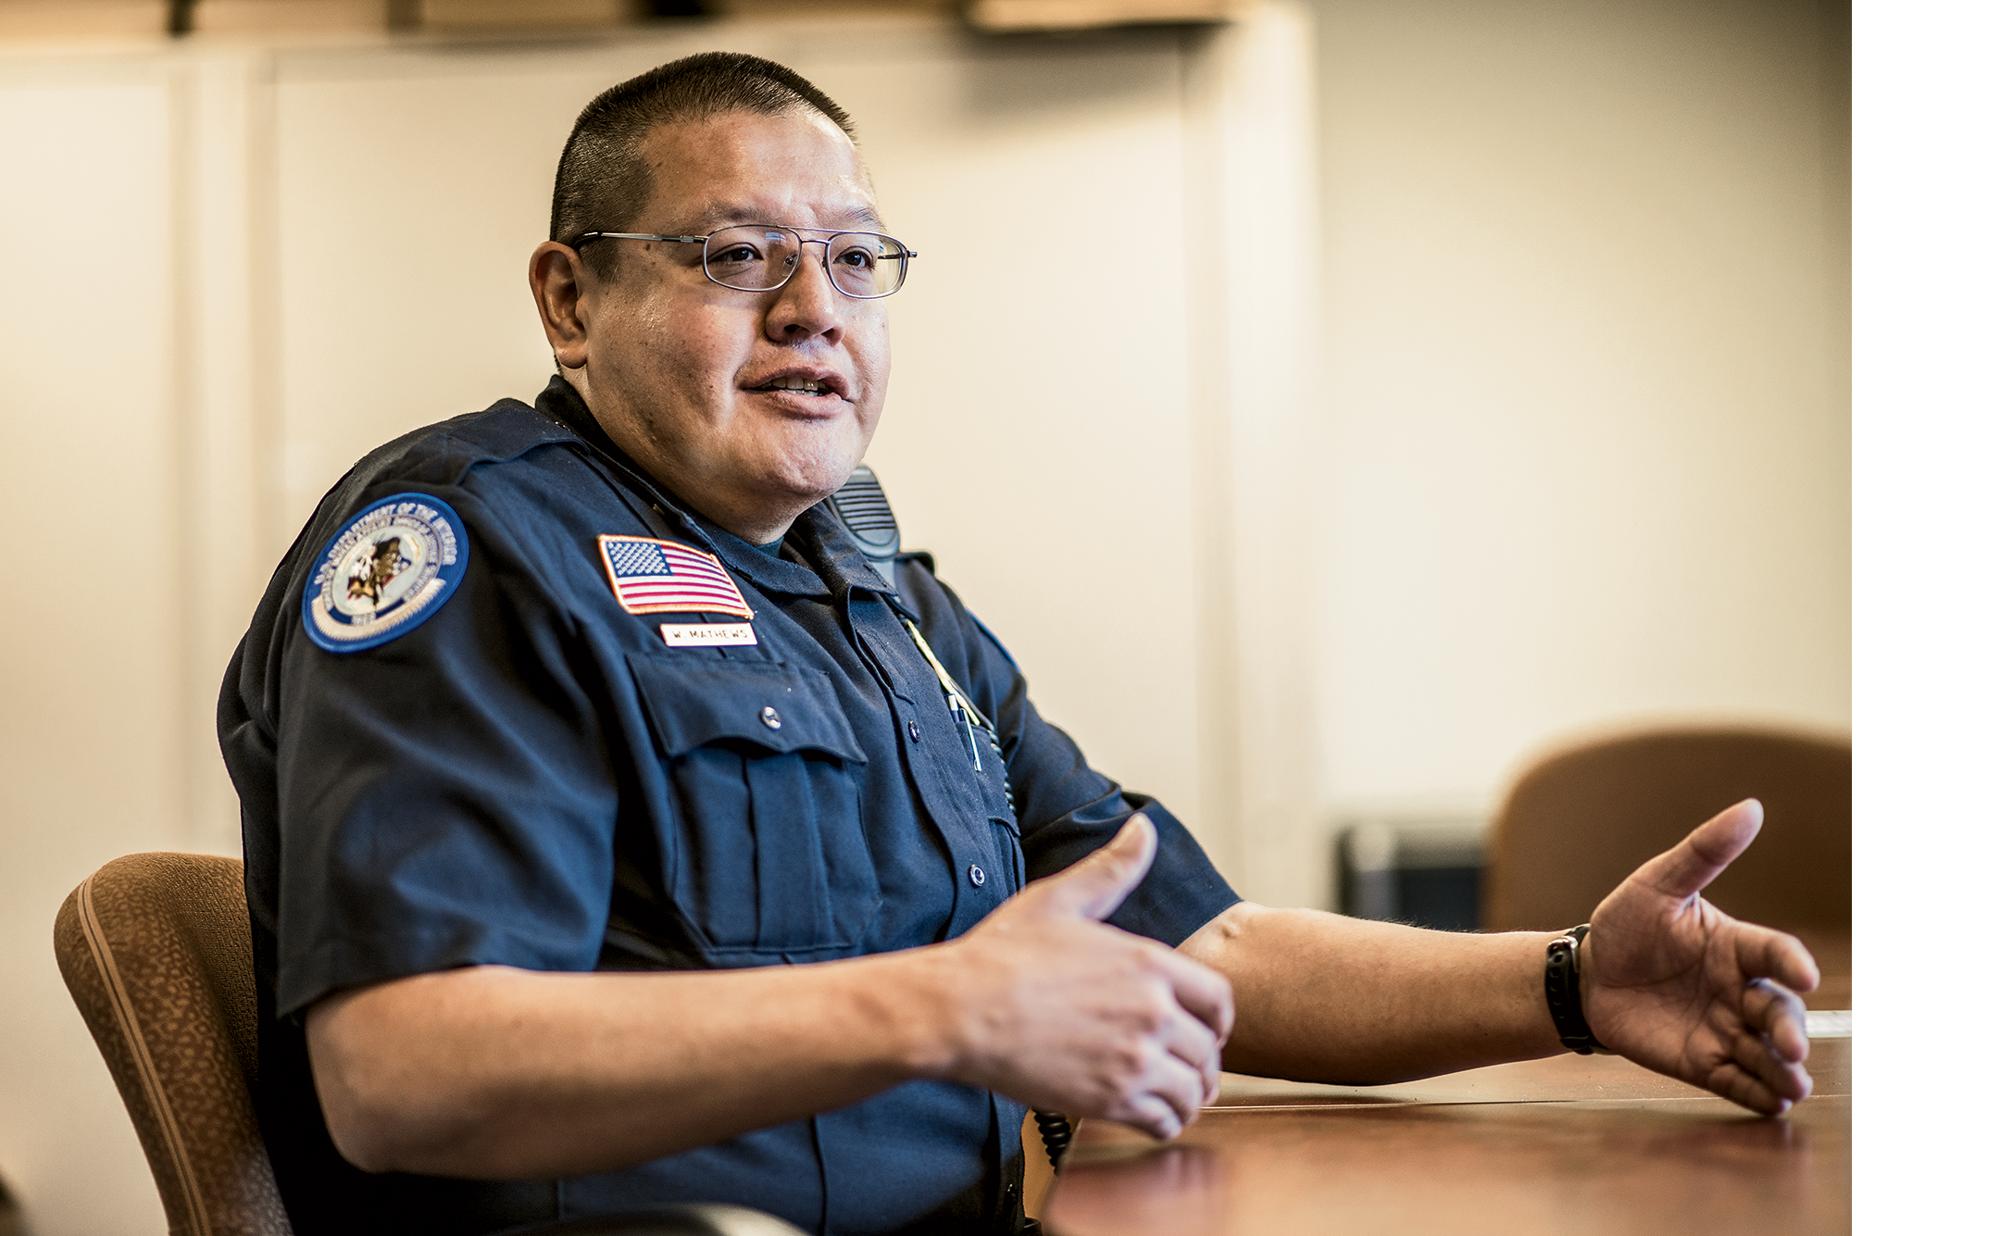 William Matthews, BIA police chief